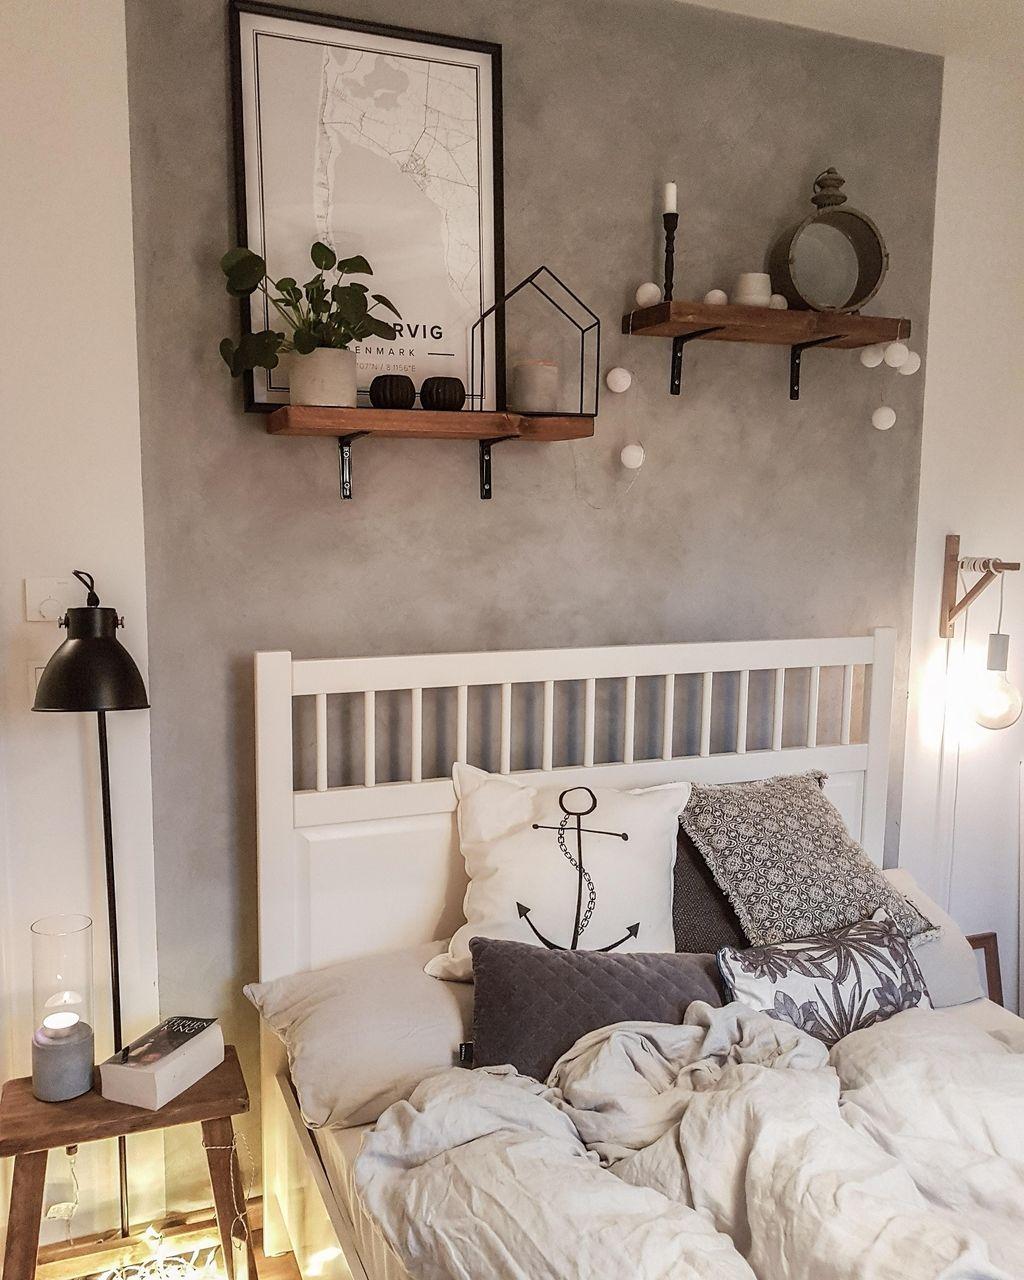 Pinterest Schlafzimmer: Mein Schlafzimmer... #bedroom #living #home #hamb